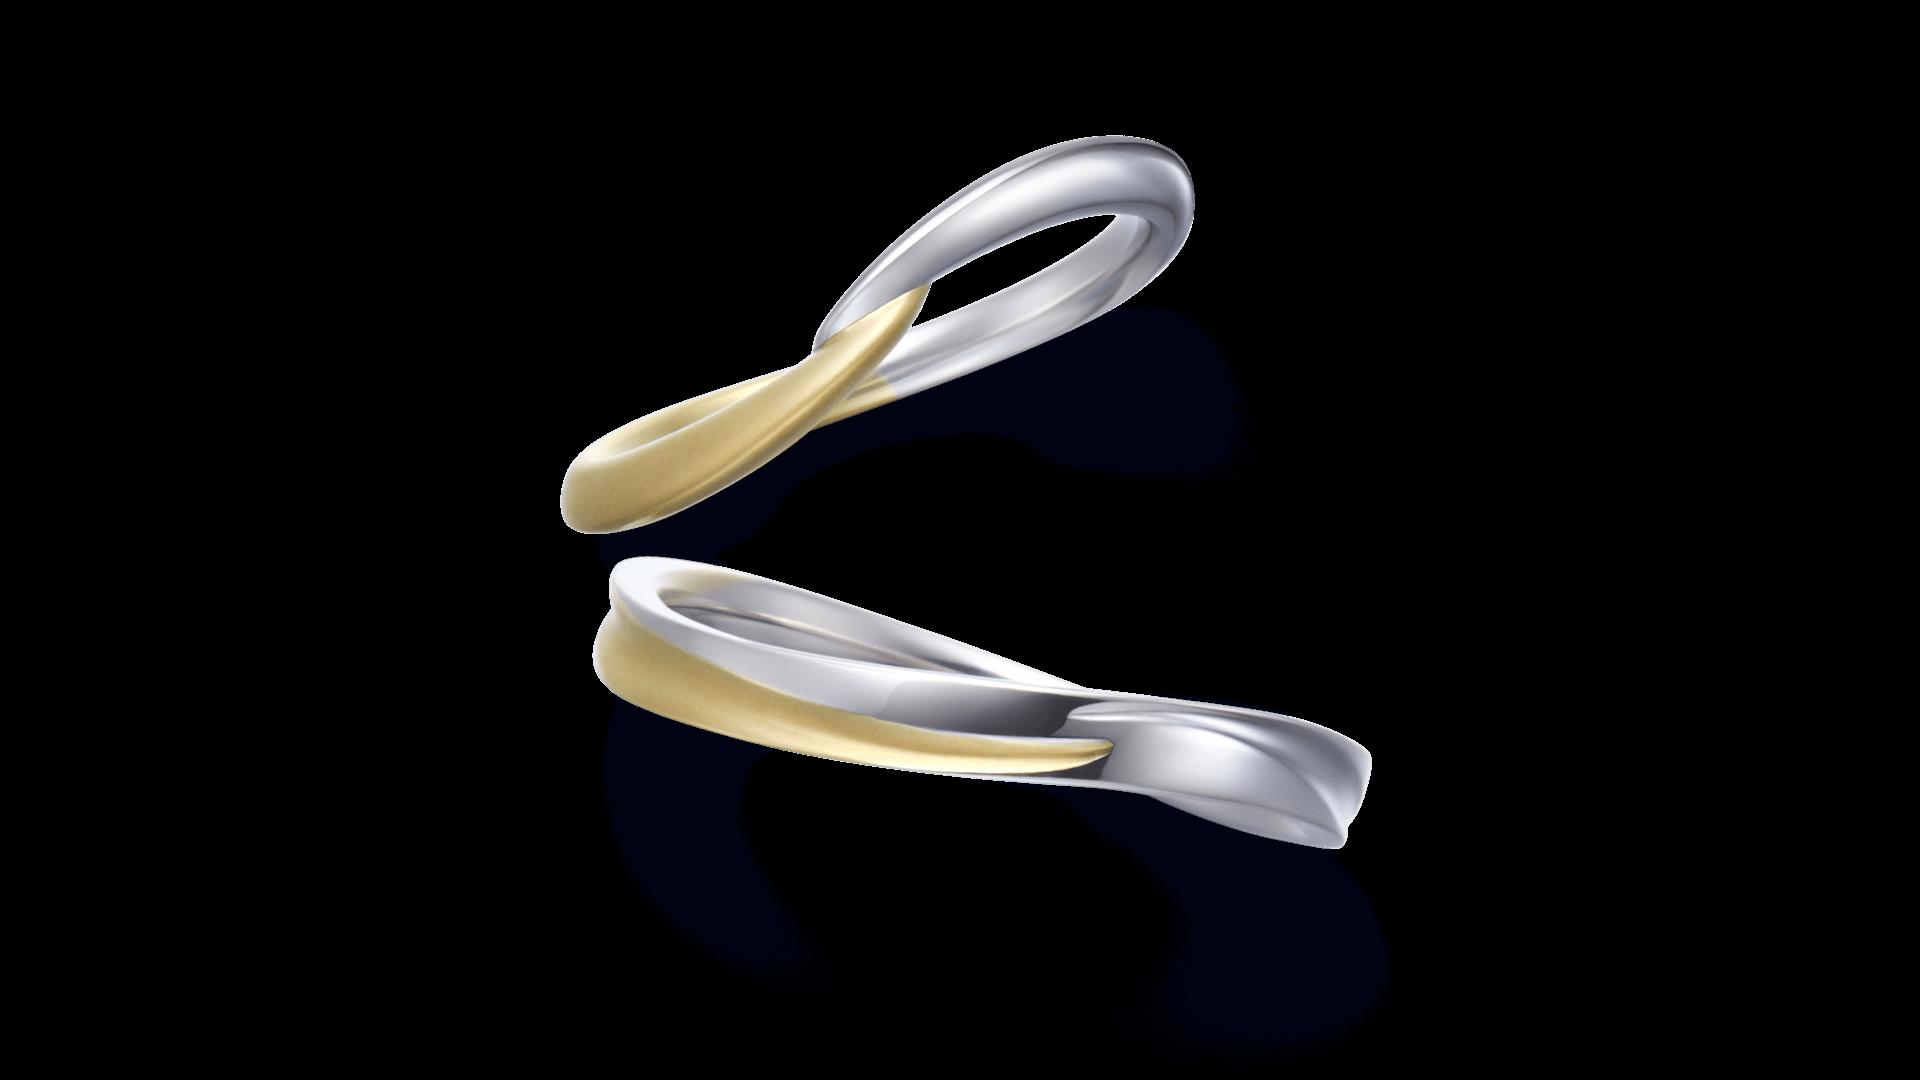 hoshiai 星逢 | 結婚指輪サムネイル 2